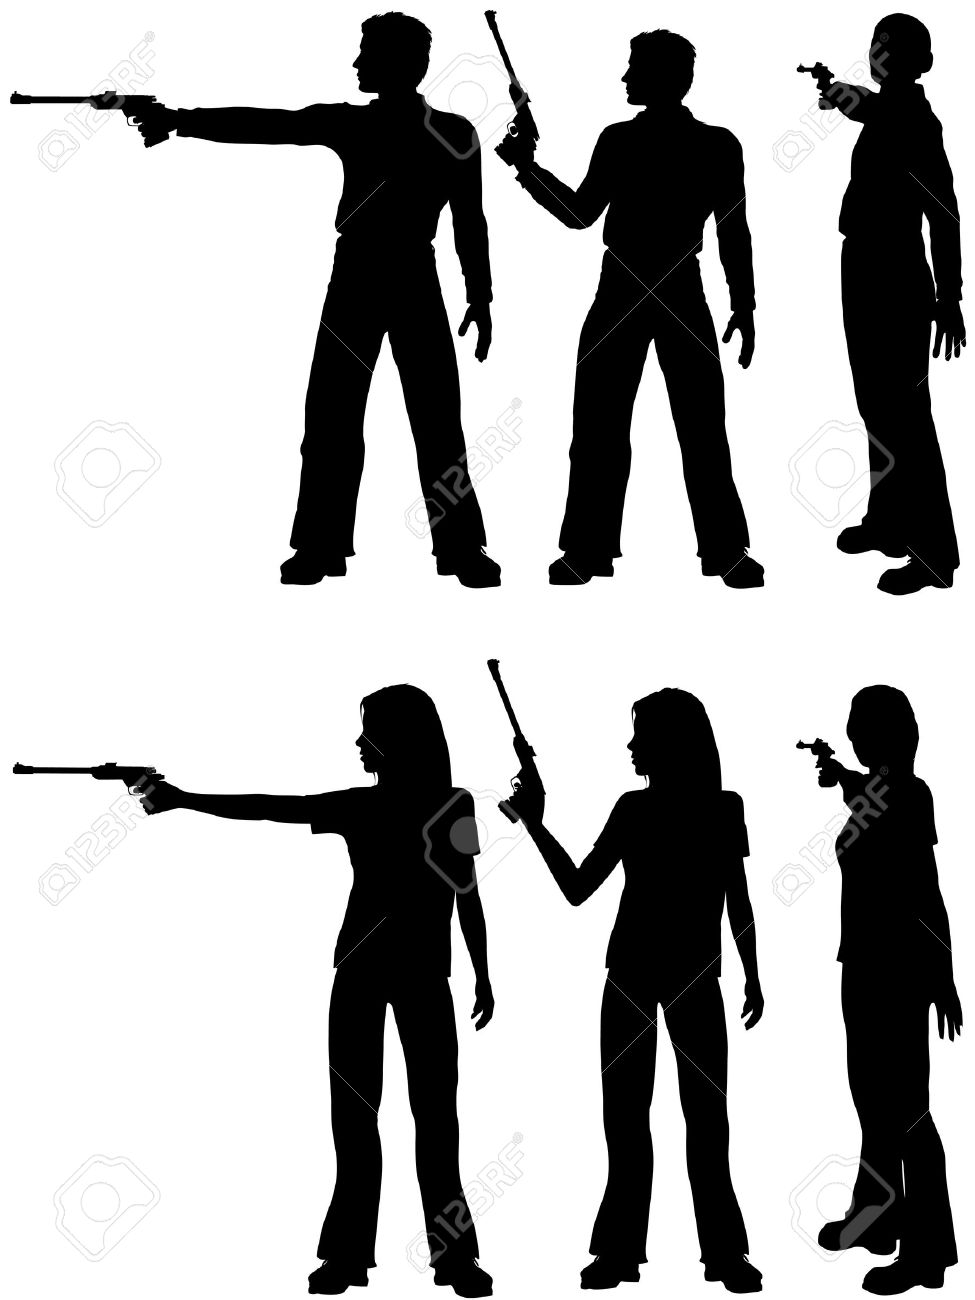 Target Pistol Shooting Stance Shoot a Target Pistol in